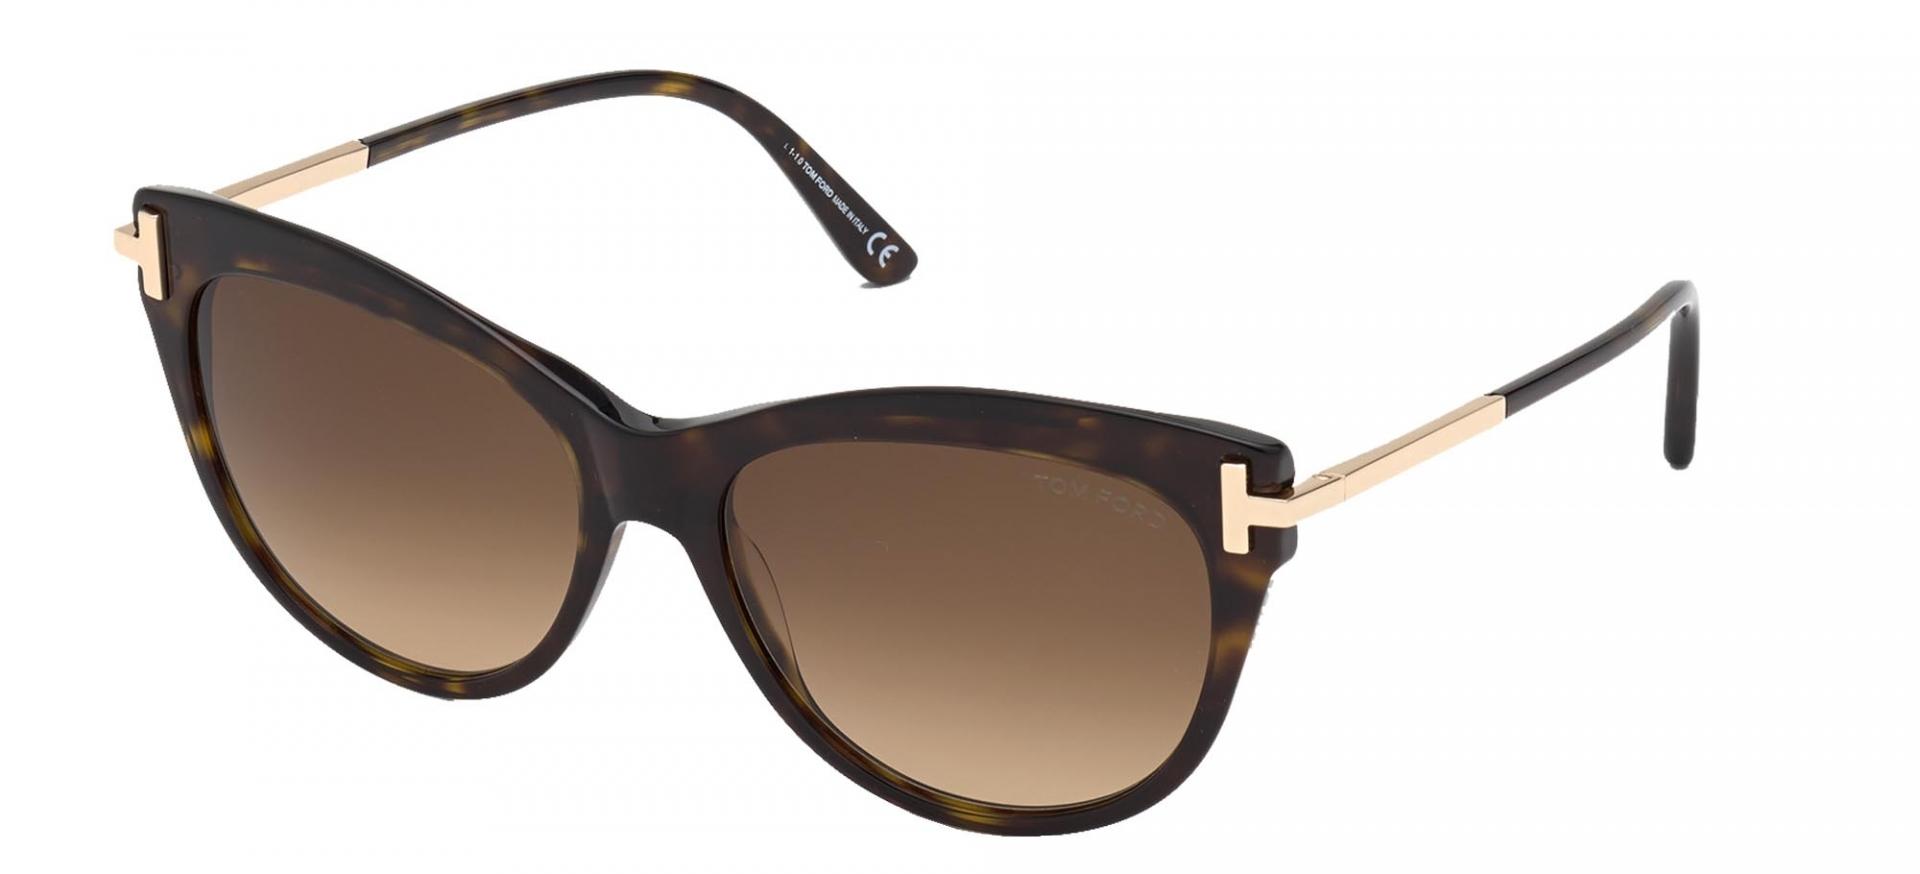 Óculos de Sol TOM FORD 0821/S 52H